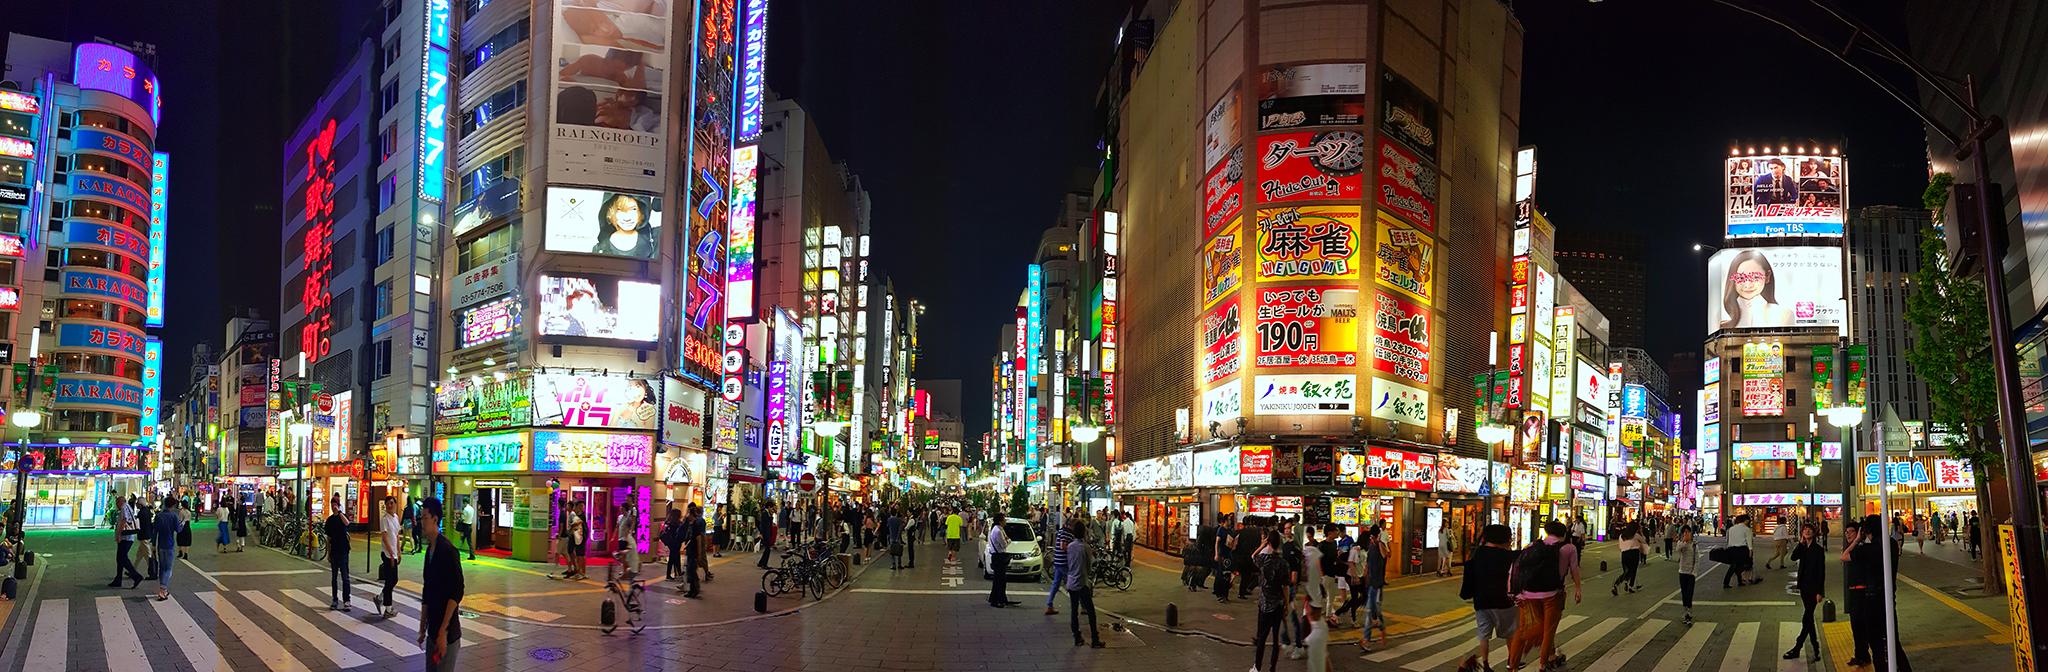 razones para visitar tokio tokyo japon razones para visitar tokio - 36904414295 a83a15de66 o - 10 razones para visitar Tokio